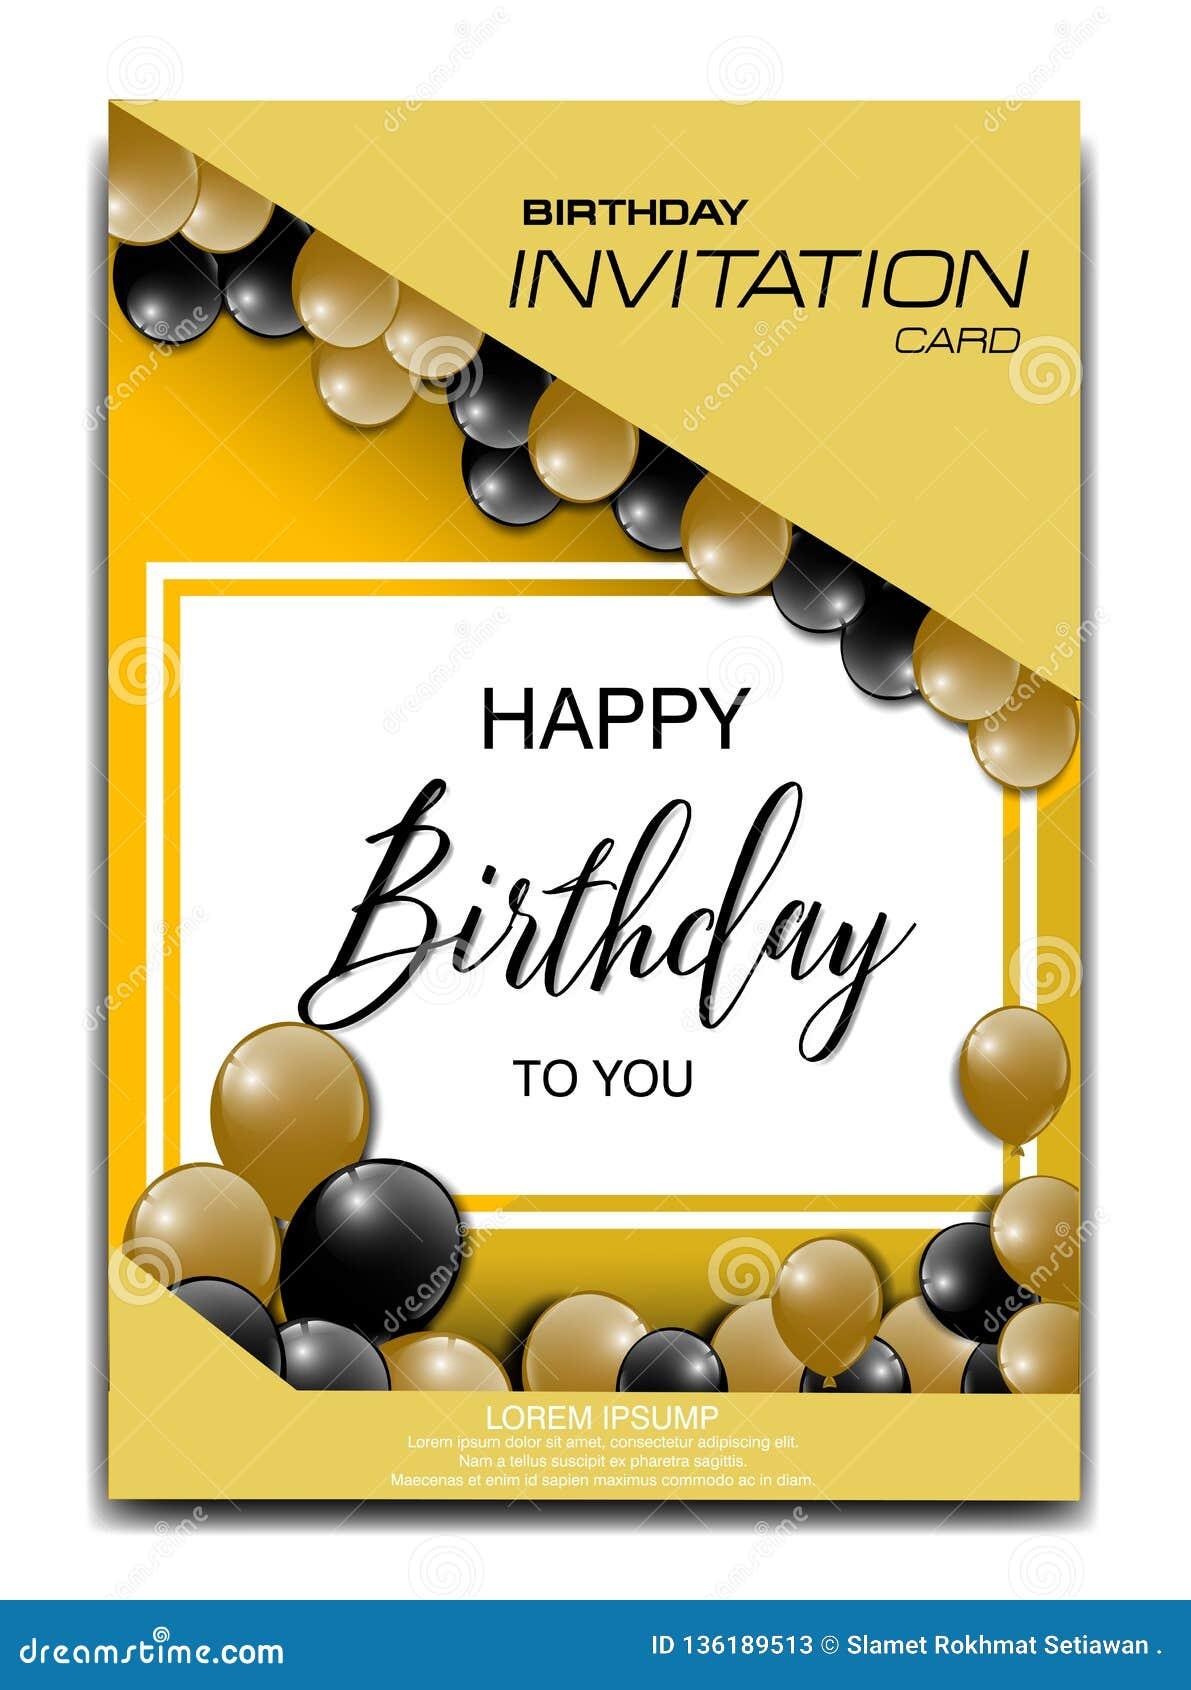 Marvelous Modern Birthday Invitation Card With Balloon Ornament Stock Vector Funny Birthday Cards Online Fluifree Goldxyz